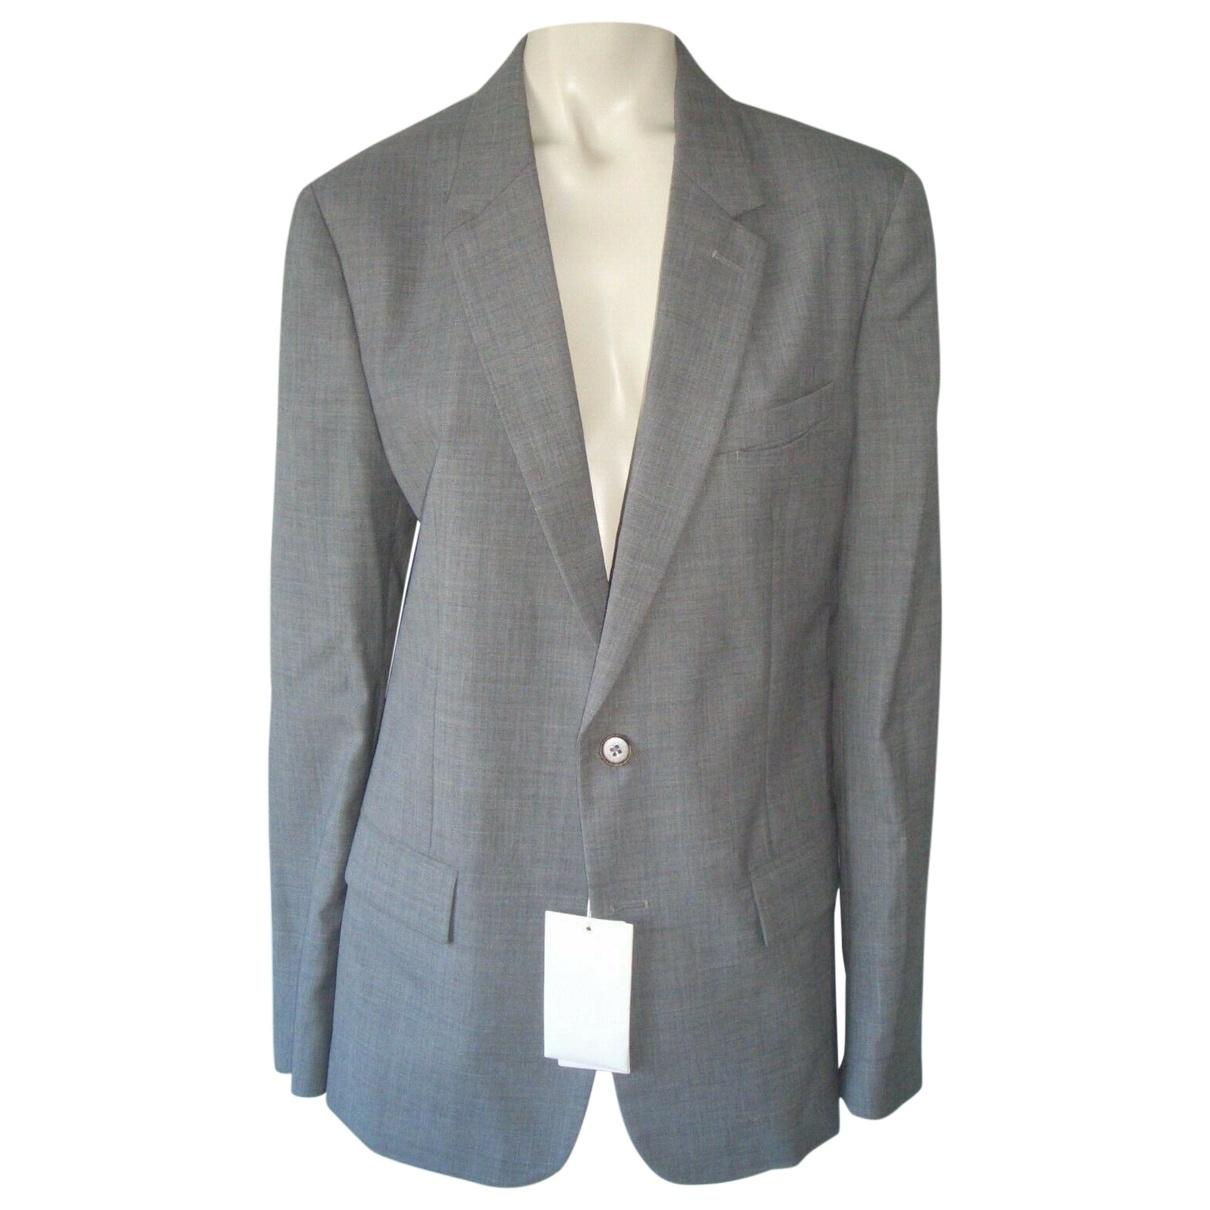 Maison Martin Margiela \N Grey Wool jacket  for Men 50 IT